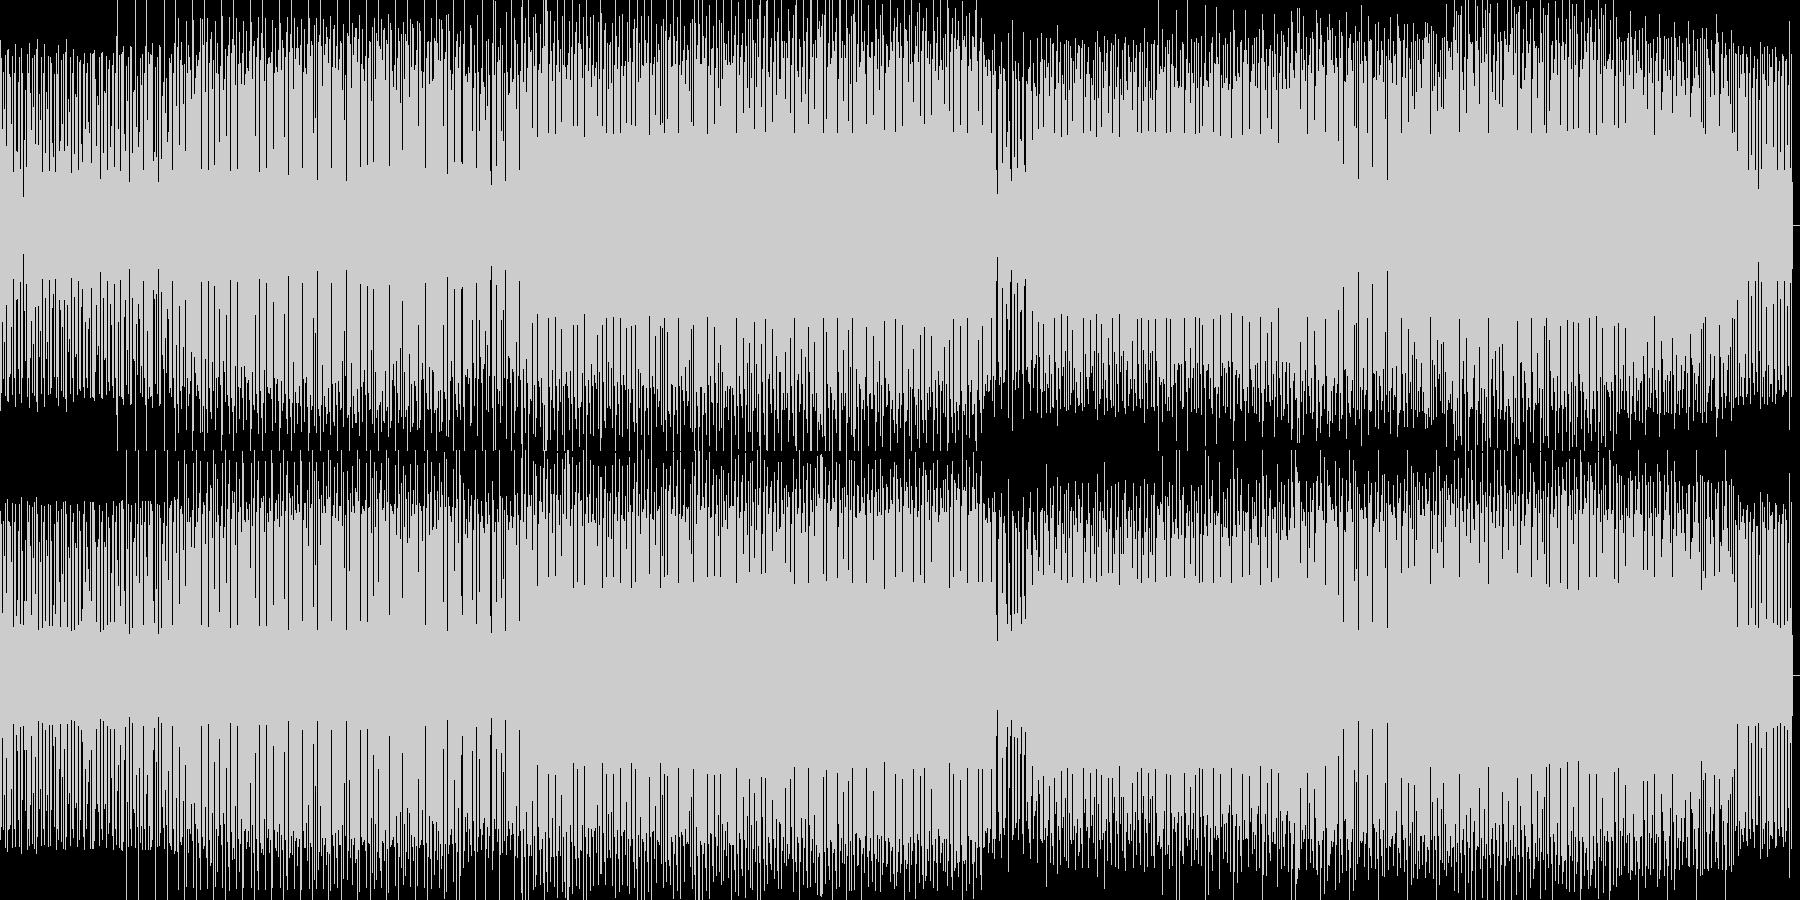 high の未再生の波形